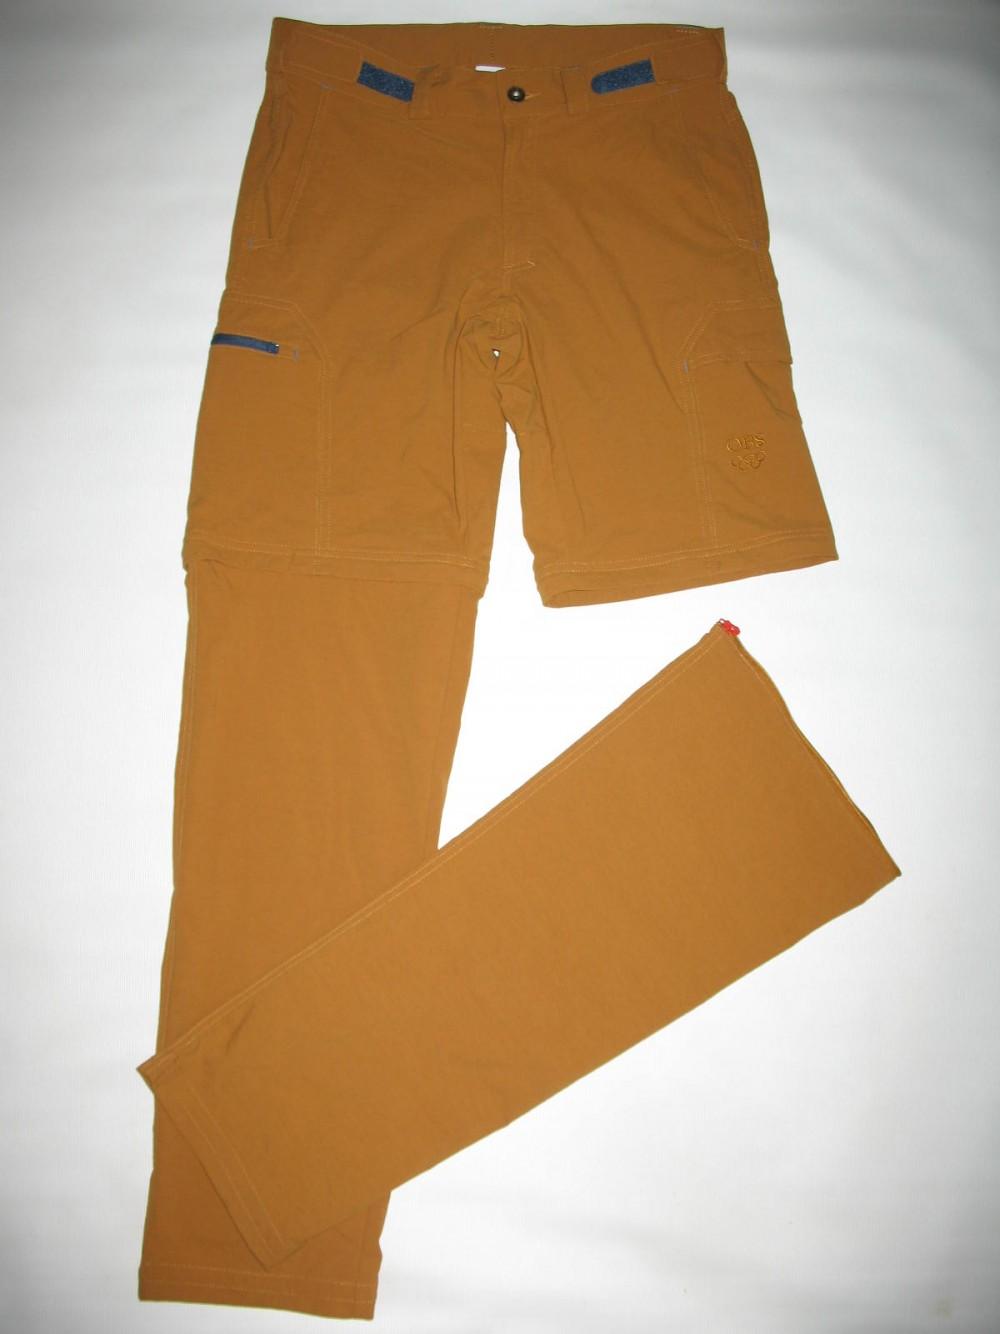 Штаны HELLY HANSEN obs olimpic 2in1 pants (размер M) - 1